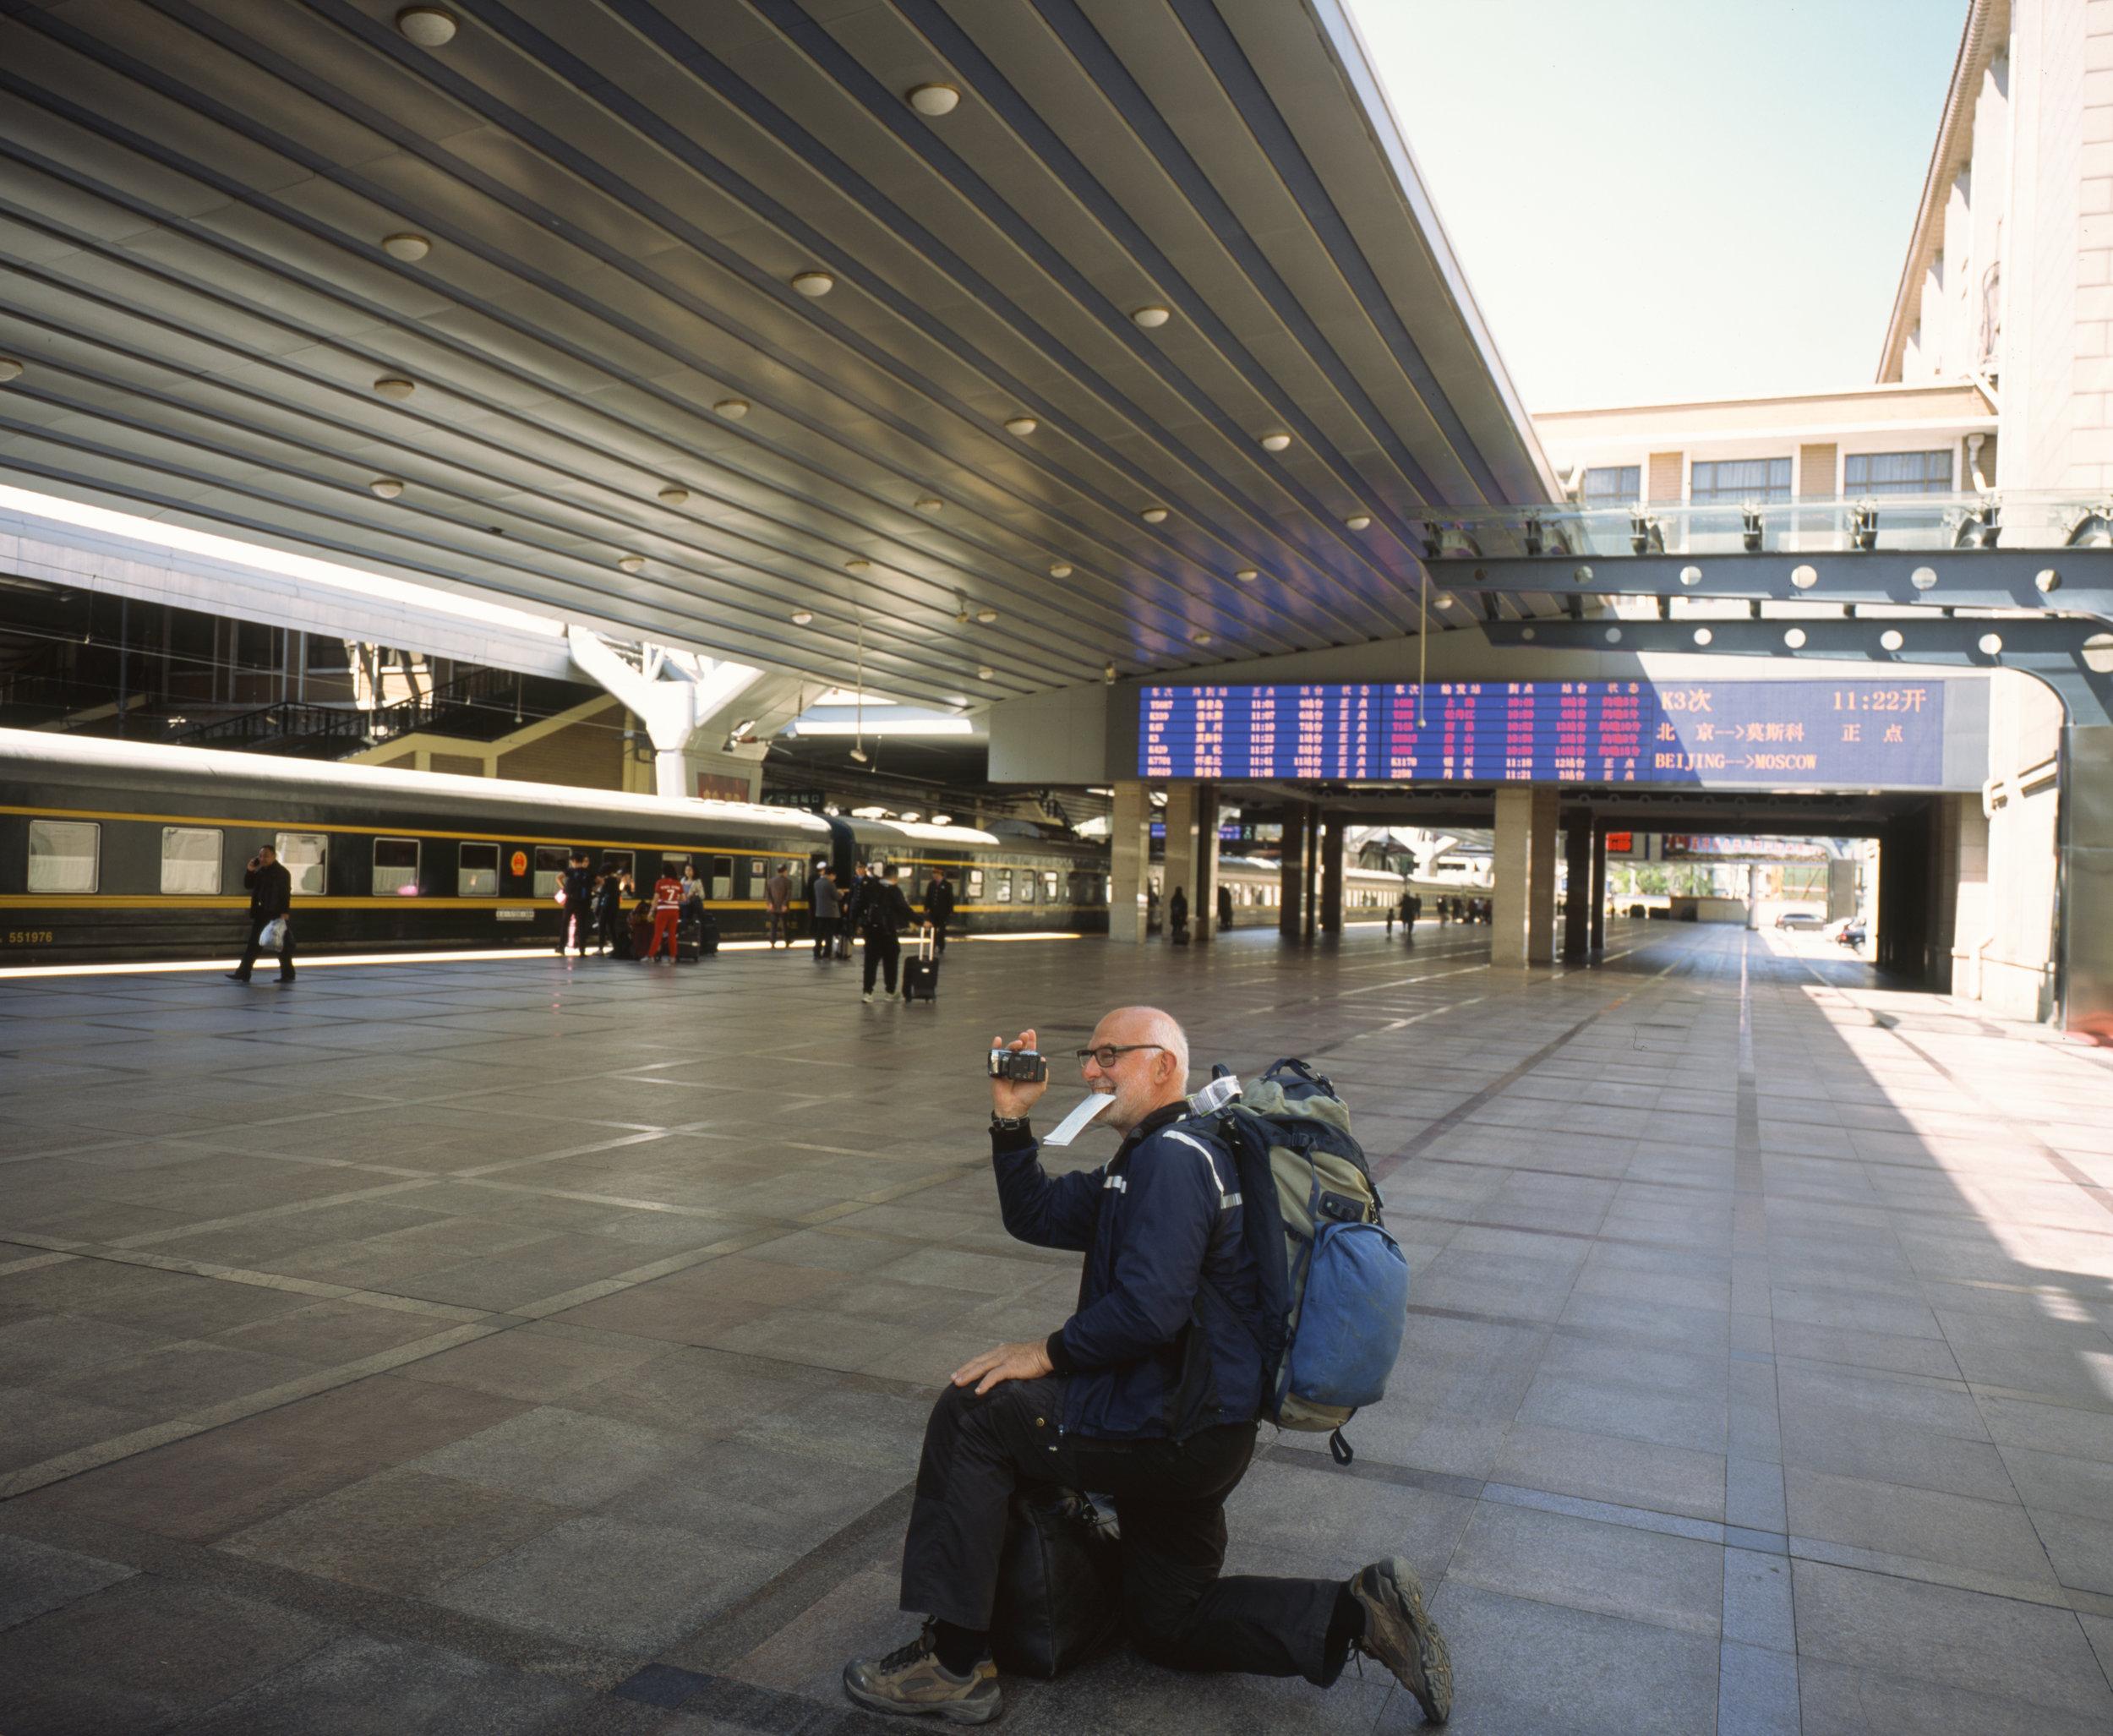 Tourists boarding and our train information in the background Fuji GF670w + Fuji Provia 100f